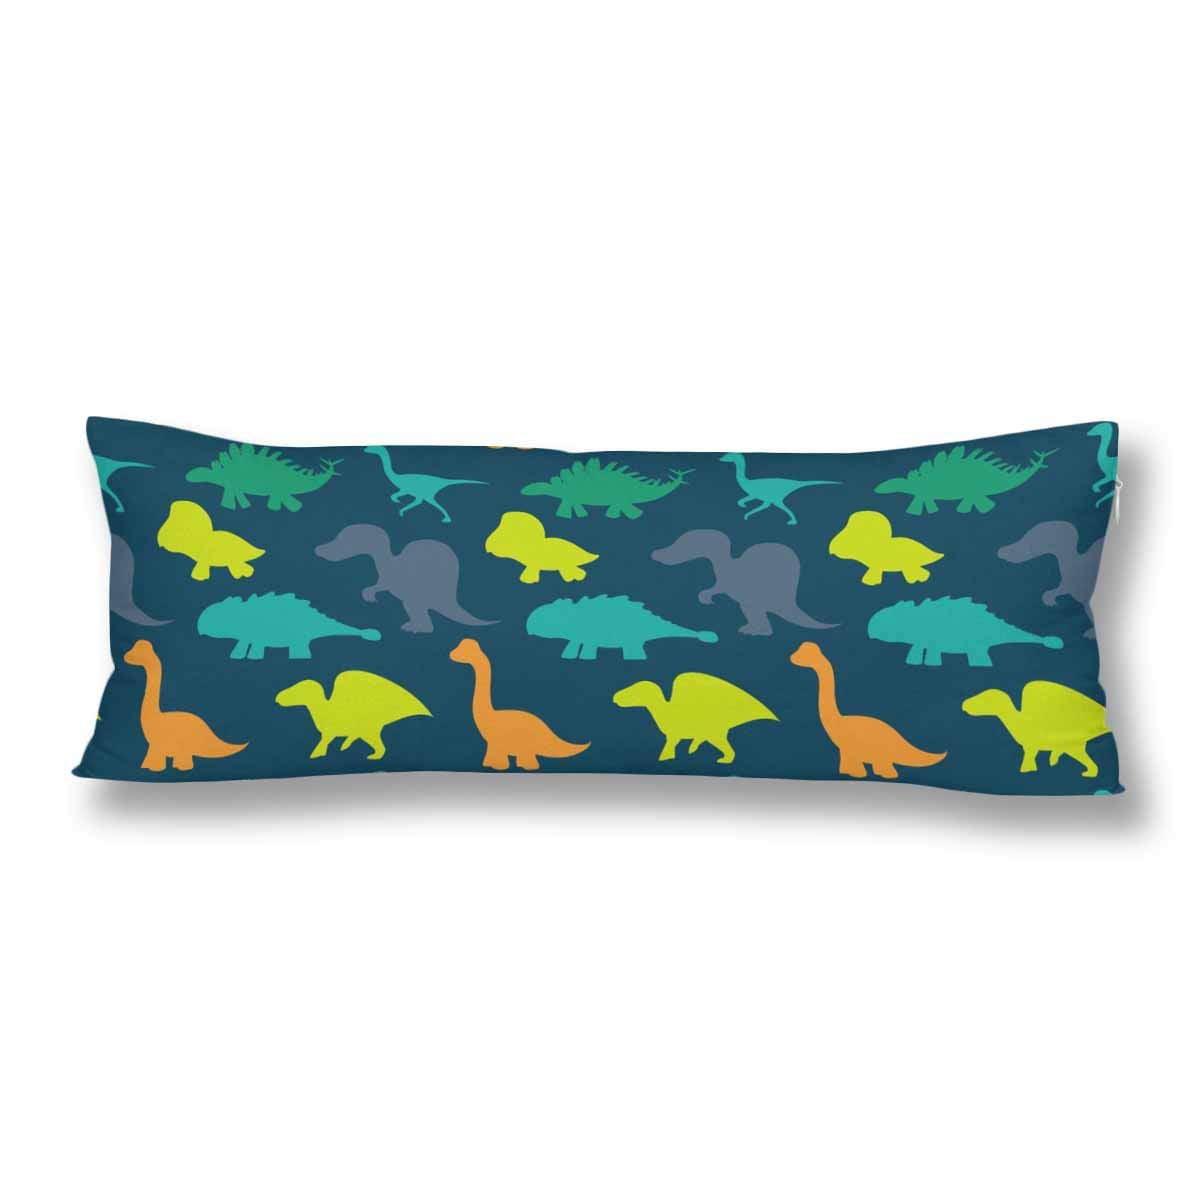 GCKG Cute Cartoon Dinosaurs Body Pillow Covers Pillowcase 20x60 inches, Ancient Animal Body Pillow Case Protector - image 2 de 2